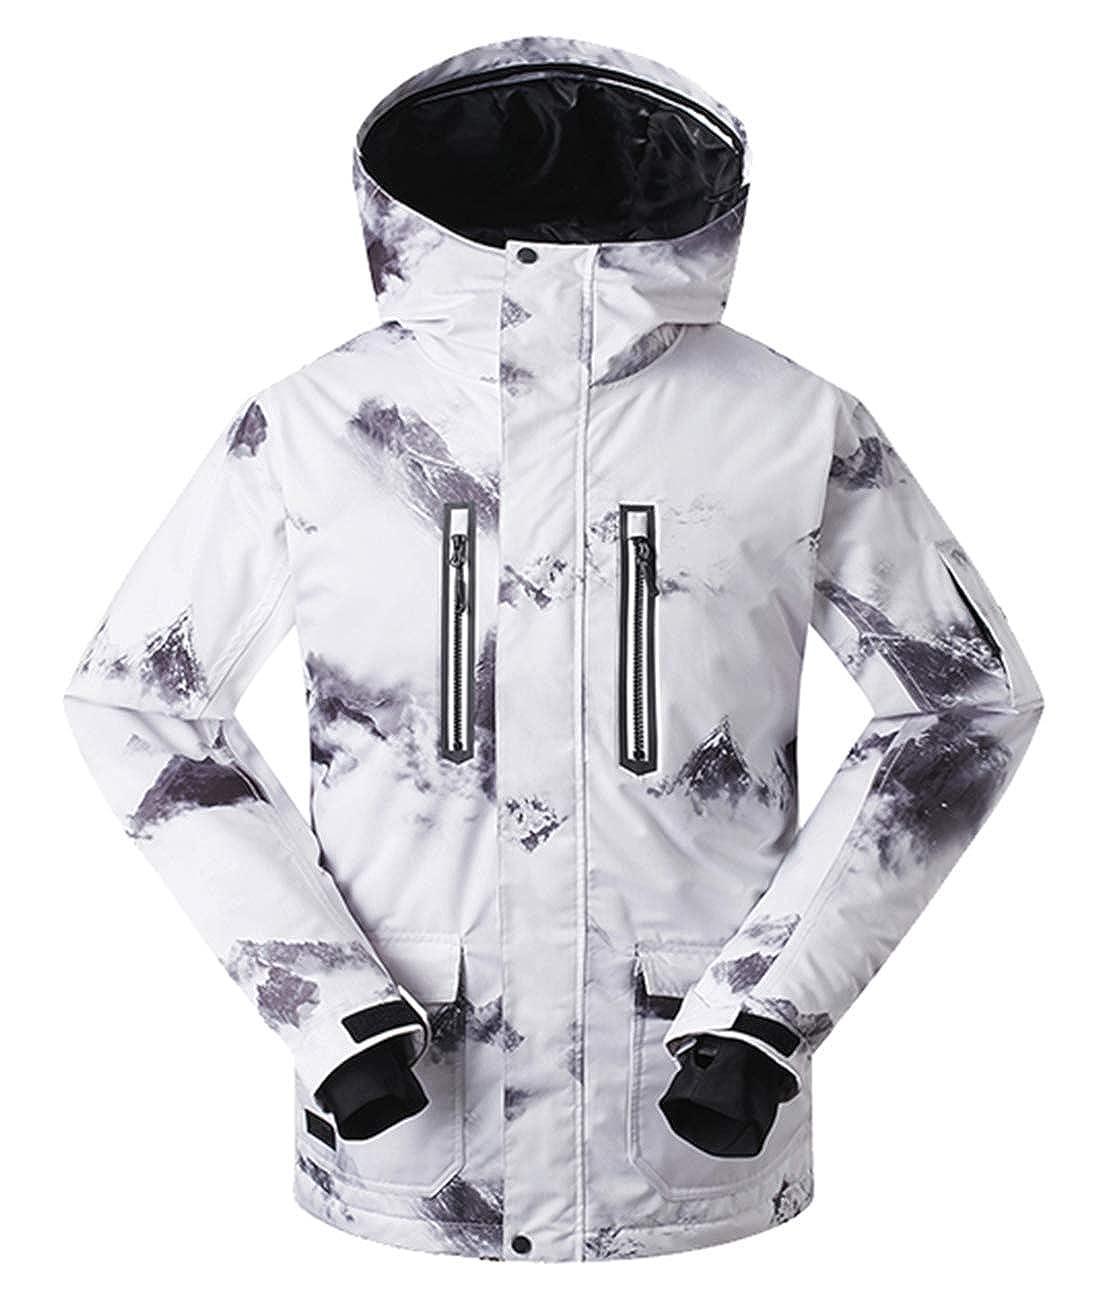 Image of APTRO Men's Bright Colored Insulated Waterproof Windproof Ski & Snowboard Jacket